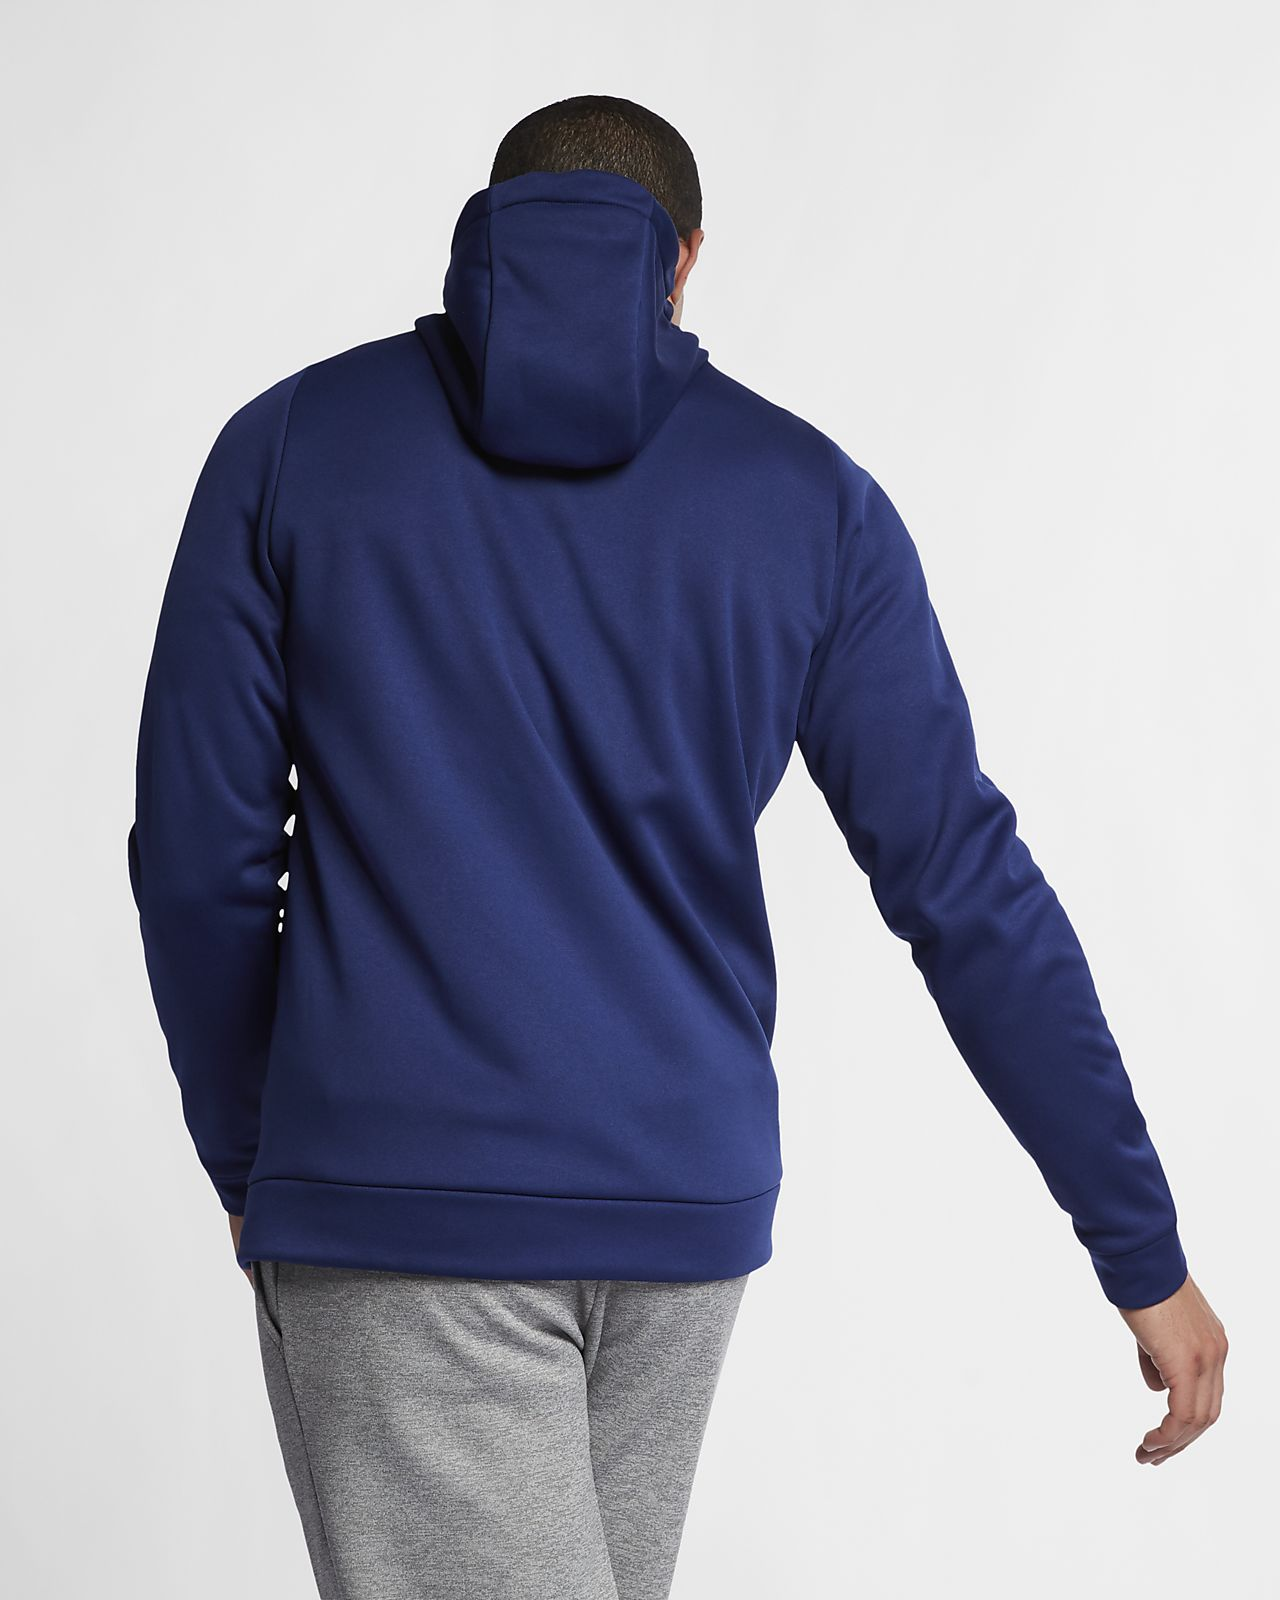 Nike Dri FIT Therma Men's Full Zip Training Hoodie